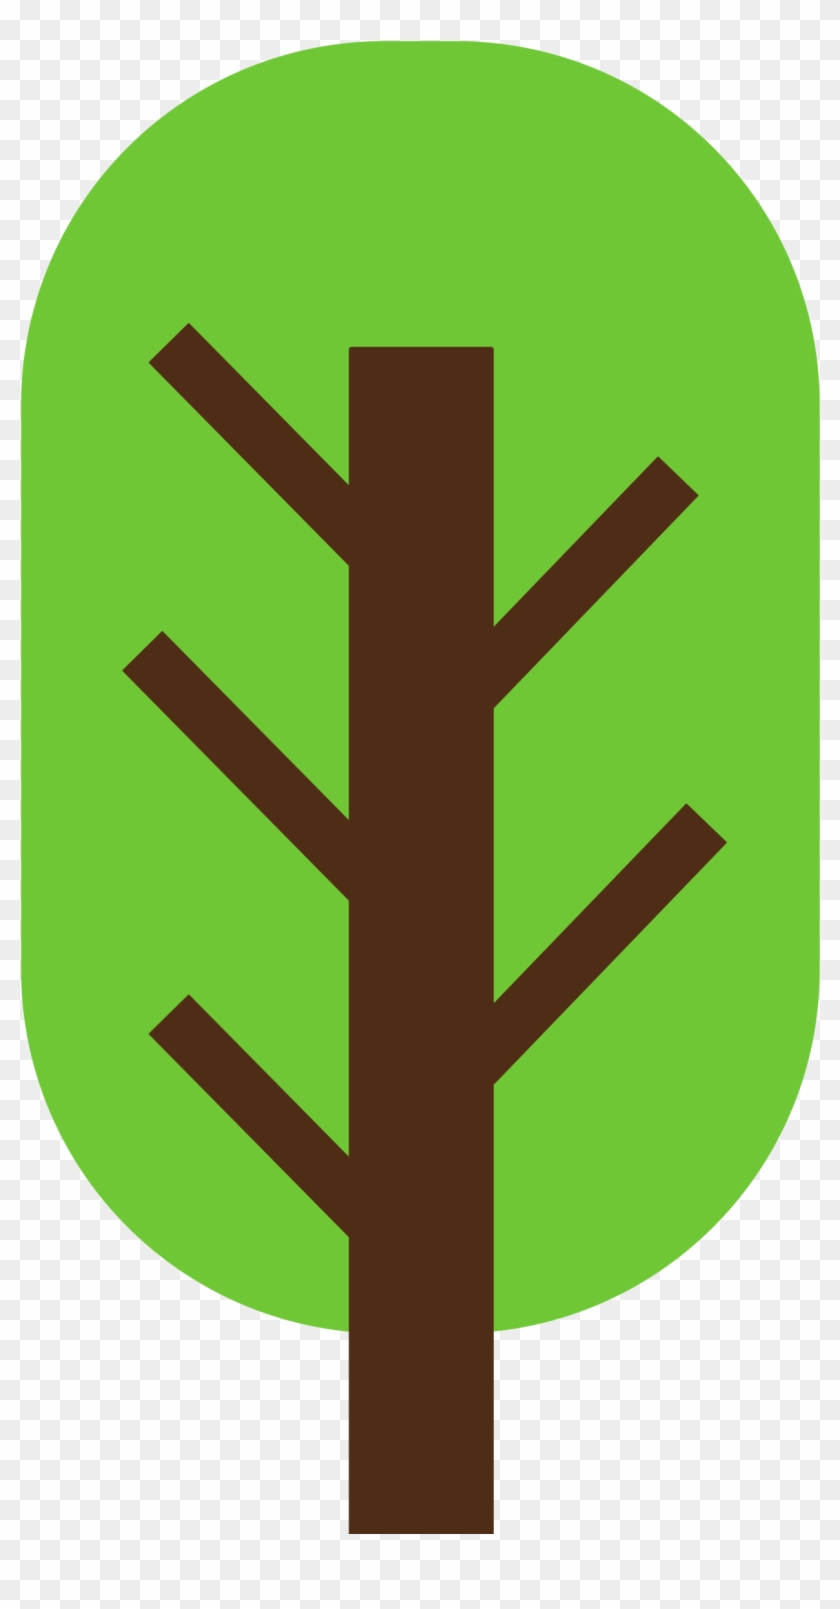 Tree 2 Color Squarish And Geometric - 2 Color #35314